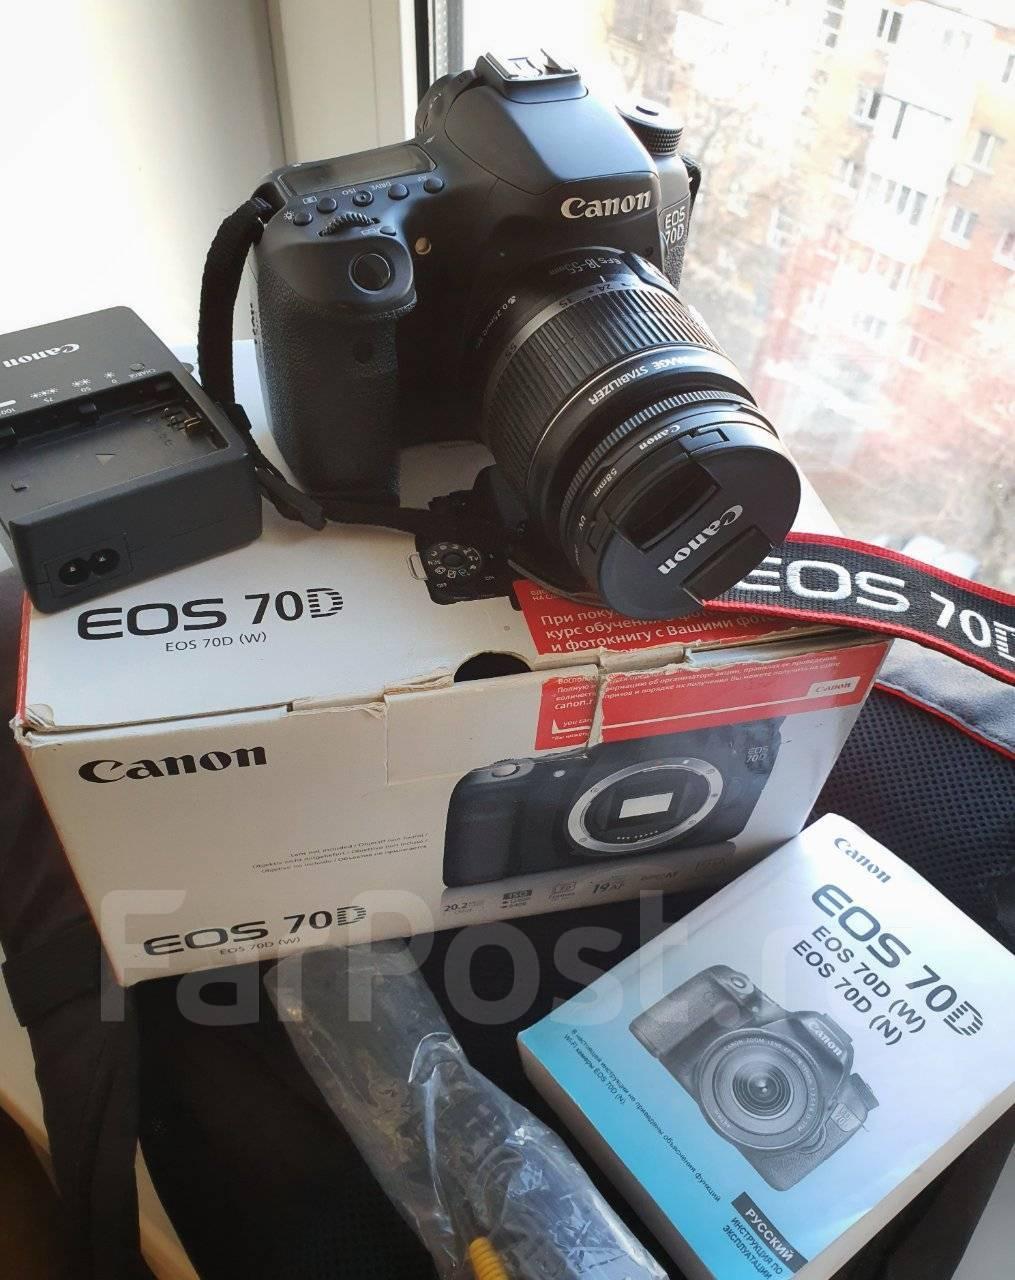 нам сервис кэнон фотоаппараты владивосток ферриньо- это